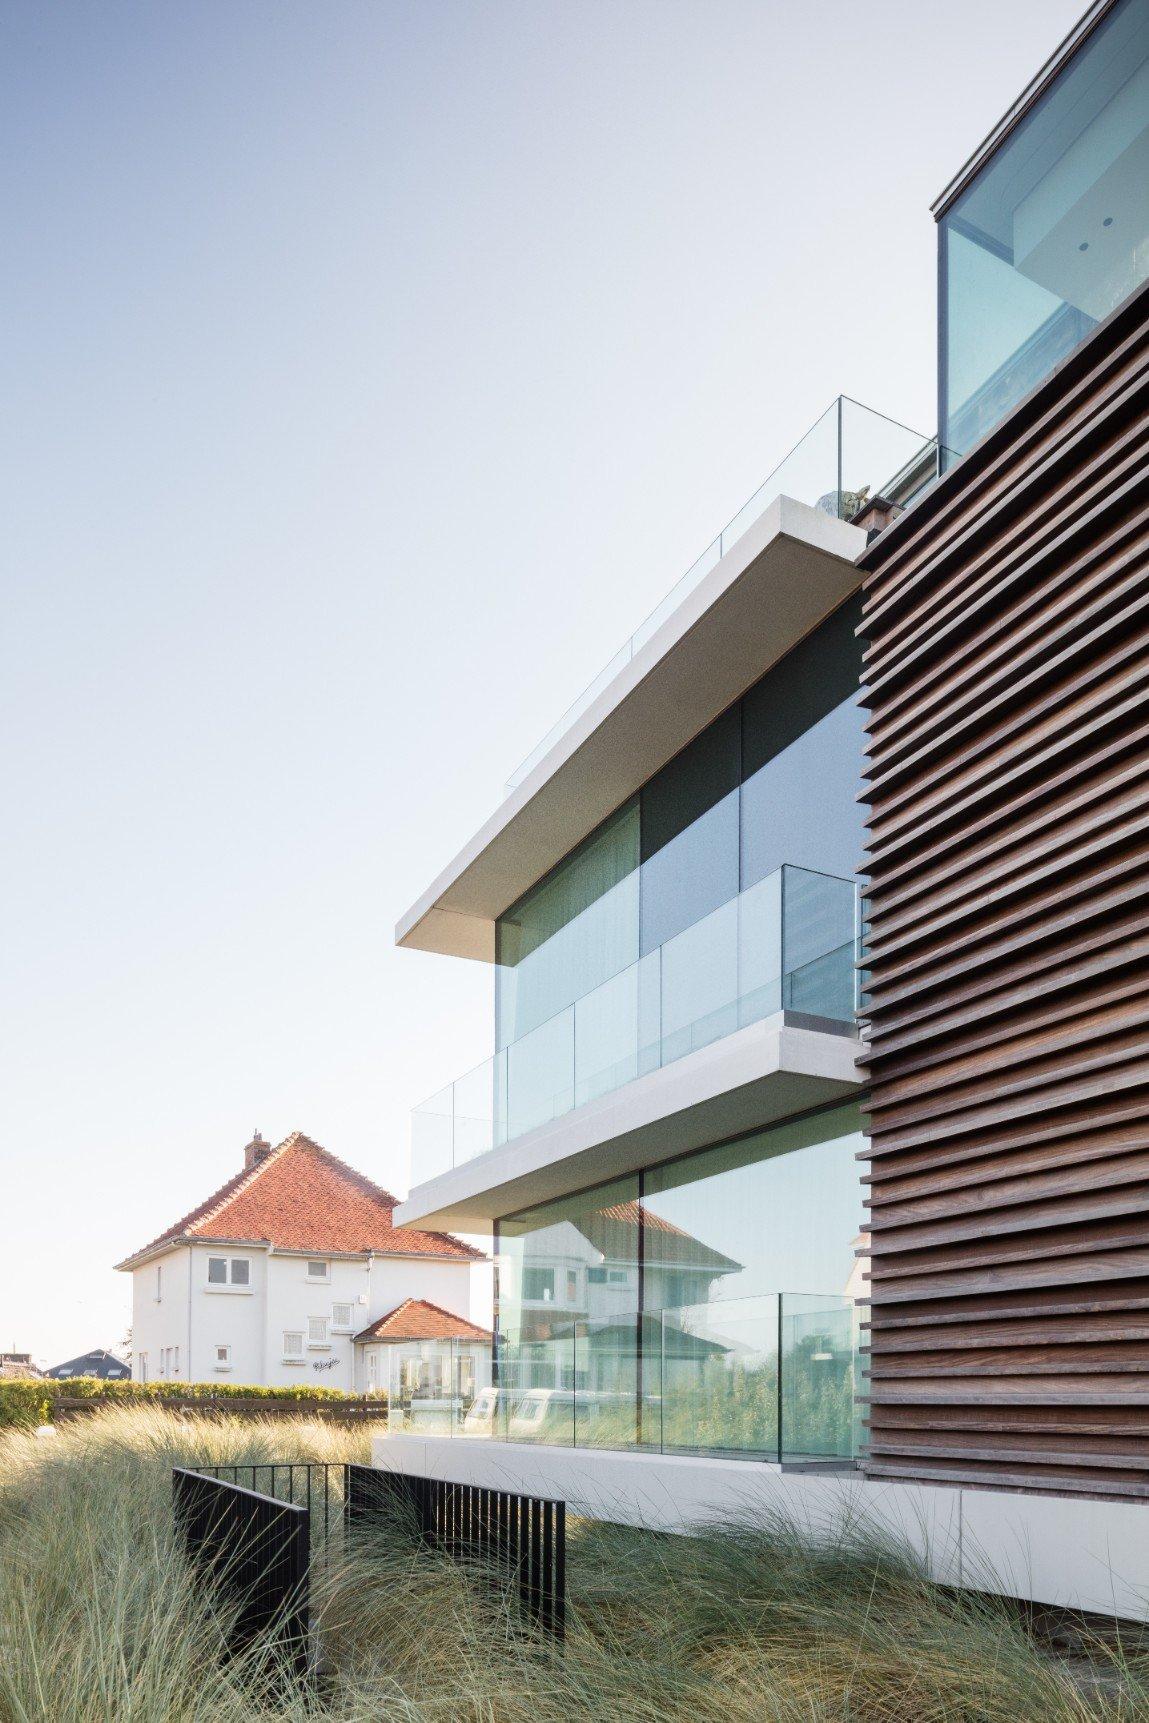 Rietveldprojects-Residence-ON-appartement-design-architectuur-kust-tvdv15.jpg